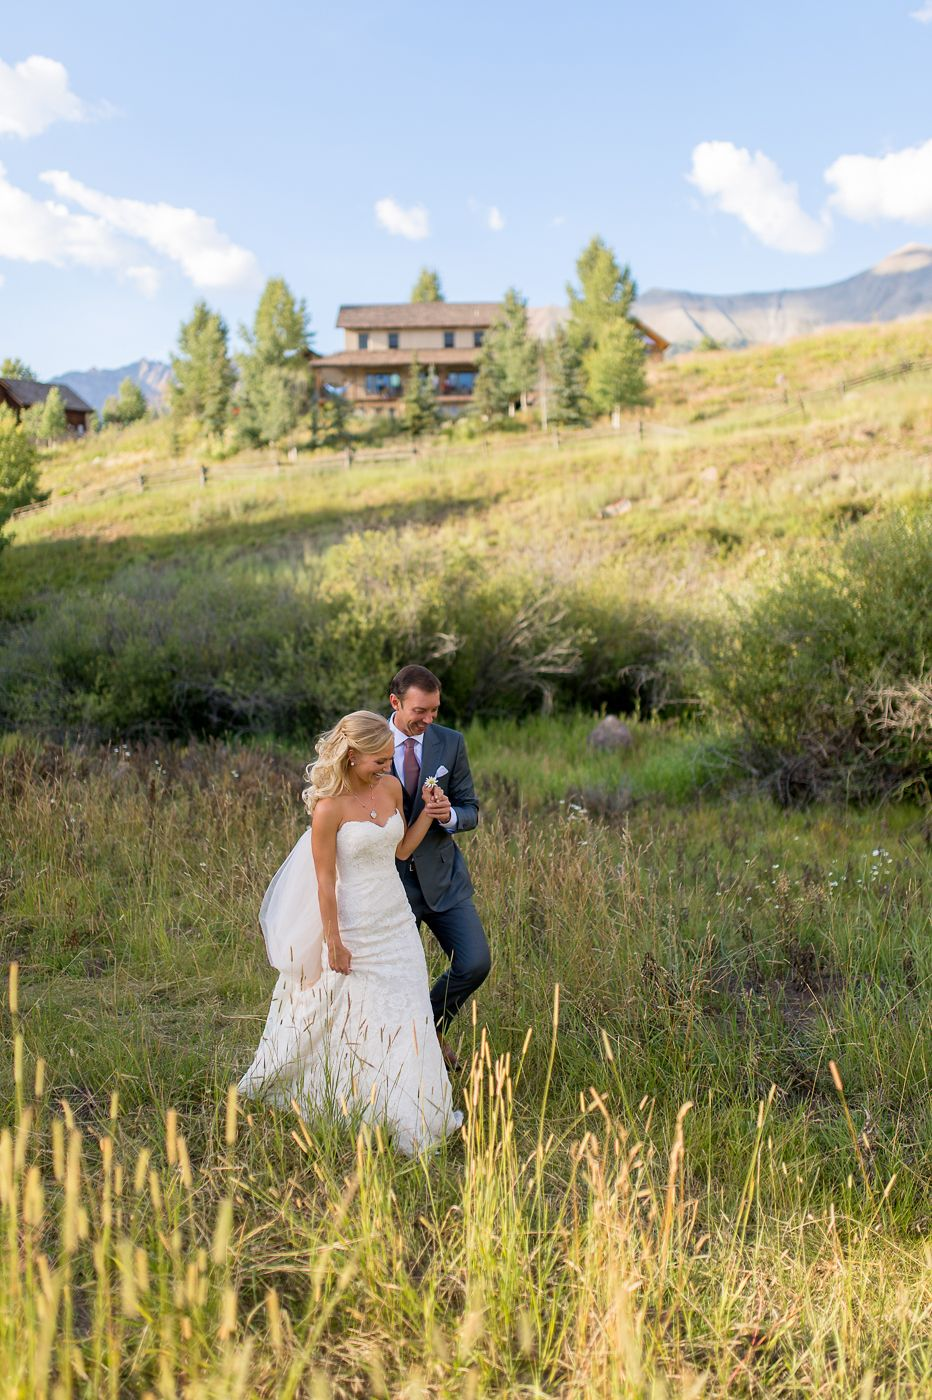 Brooke Werner Chad Knaus Chowen Photography Chad Knaus Wedding Engagement Photos Photography